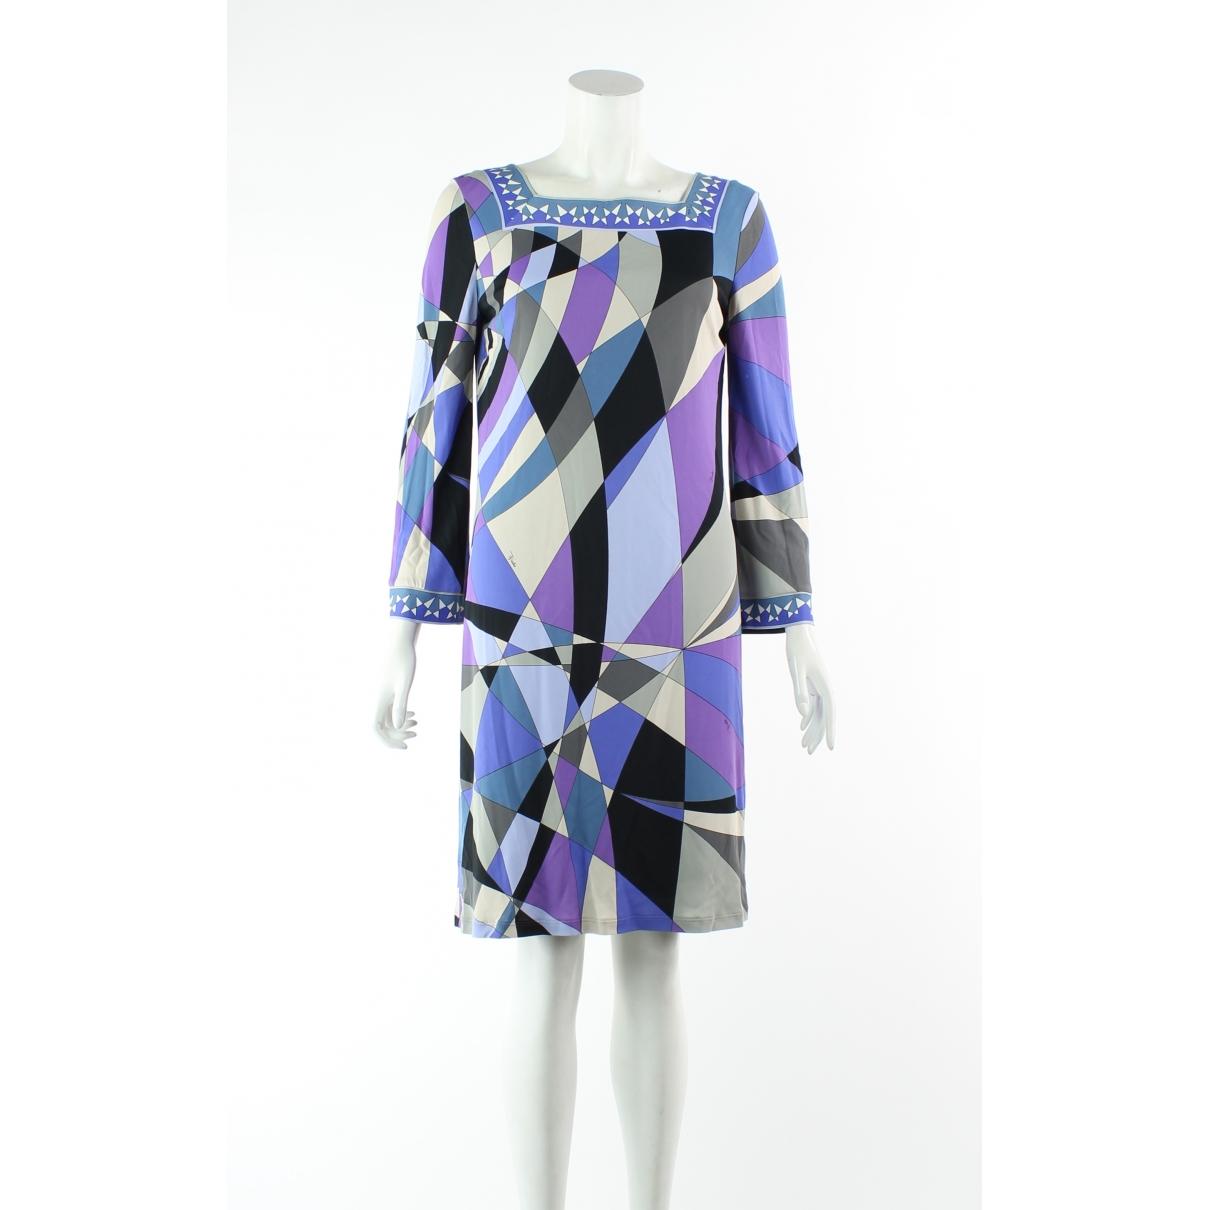 Emilio Pucci \N Multicolour dress for Women 10 US